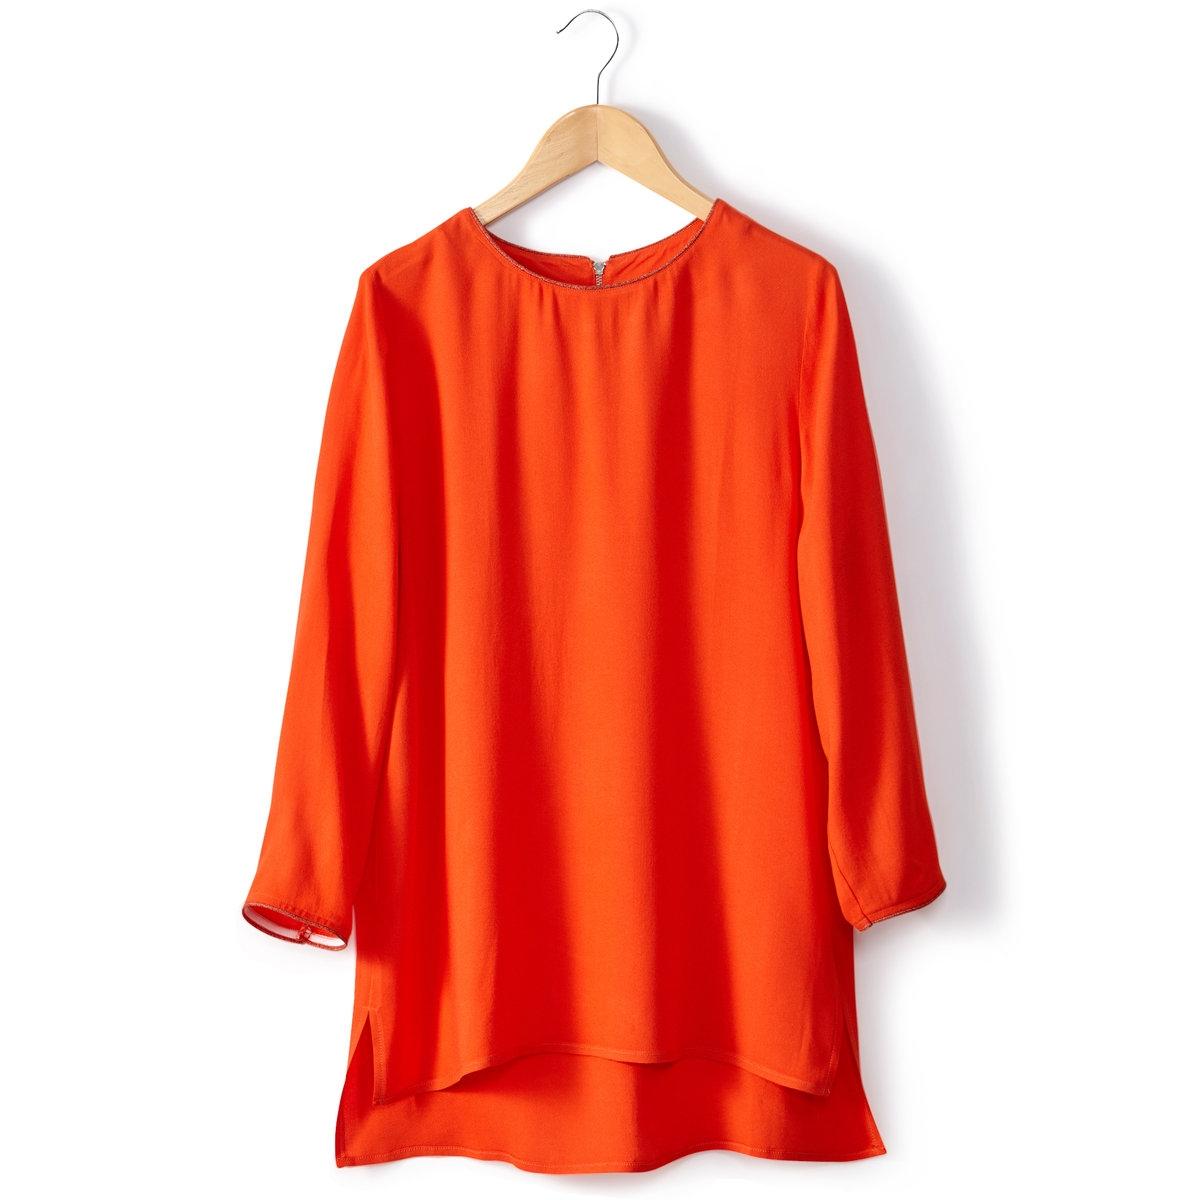 Блузка с вырезом-лодочкой<br><br>Цвет: красный<br>Размер: 38 (FR) - 44 (RUS)